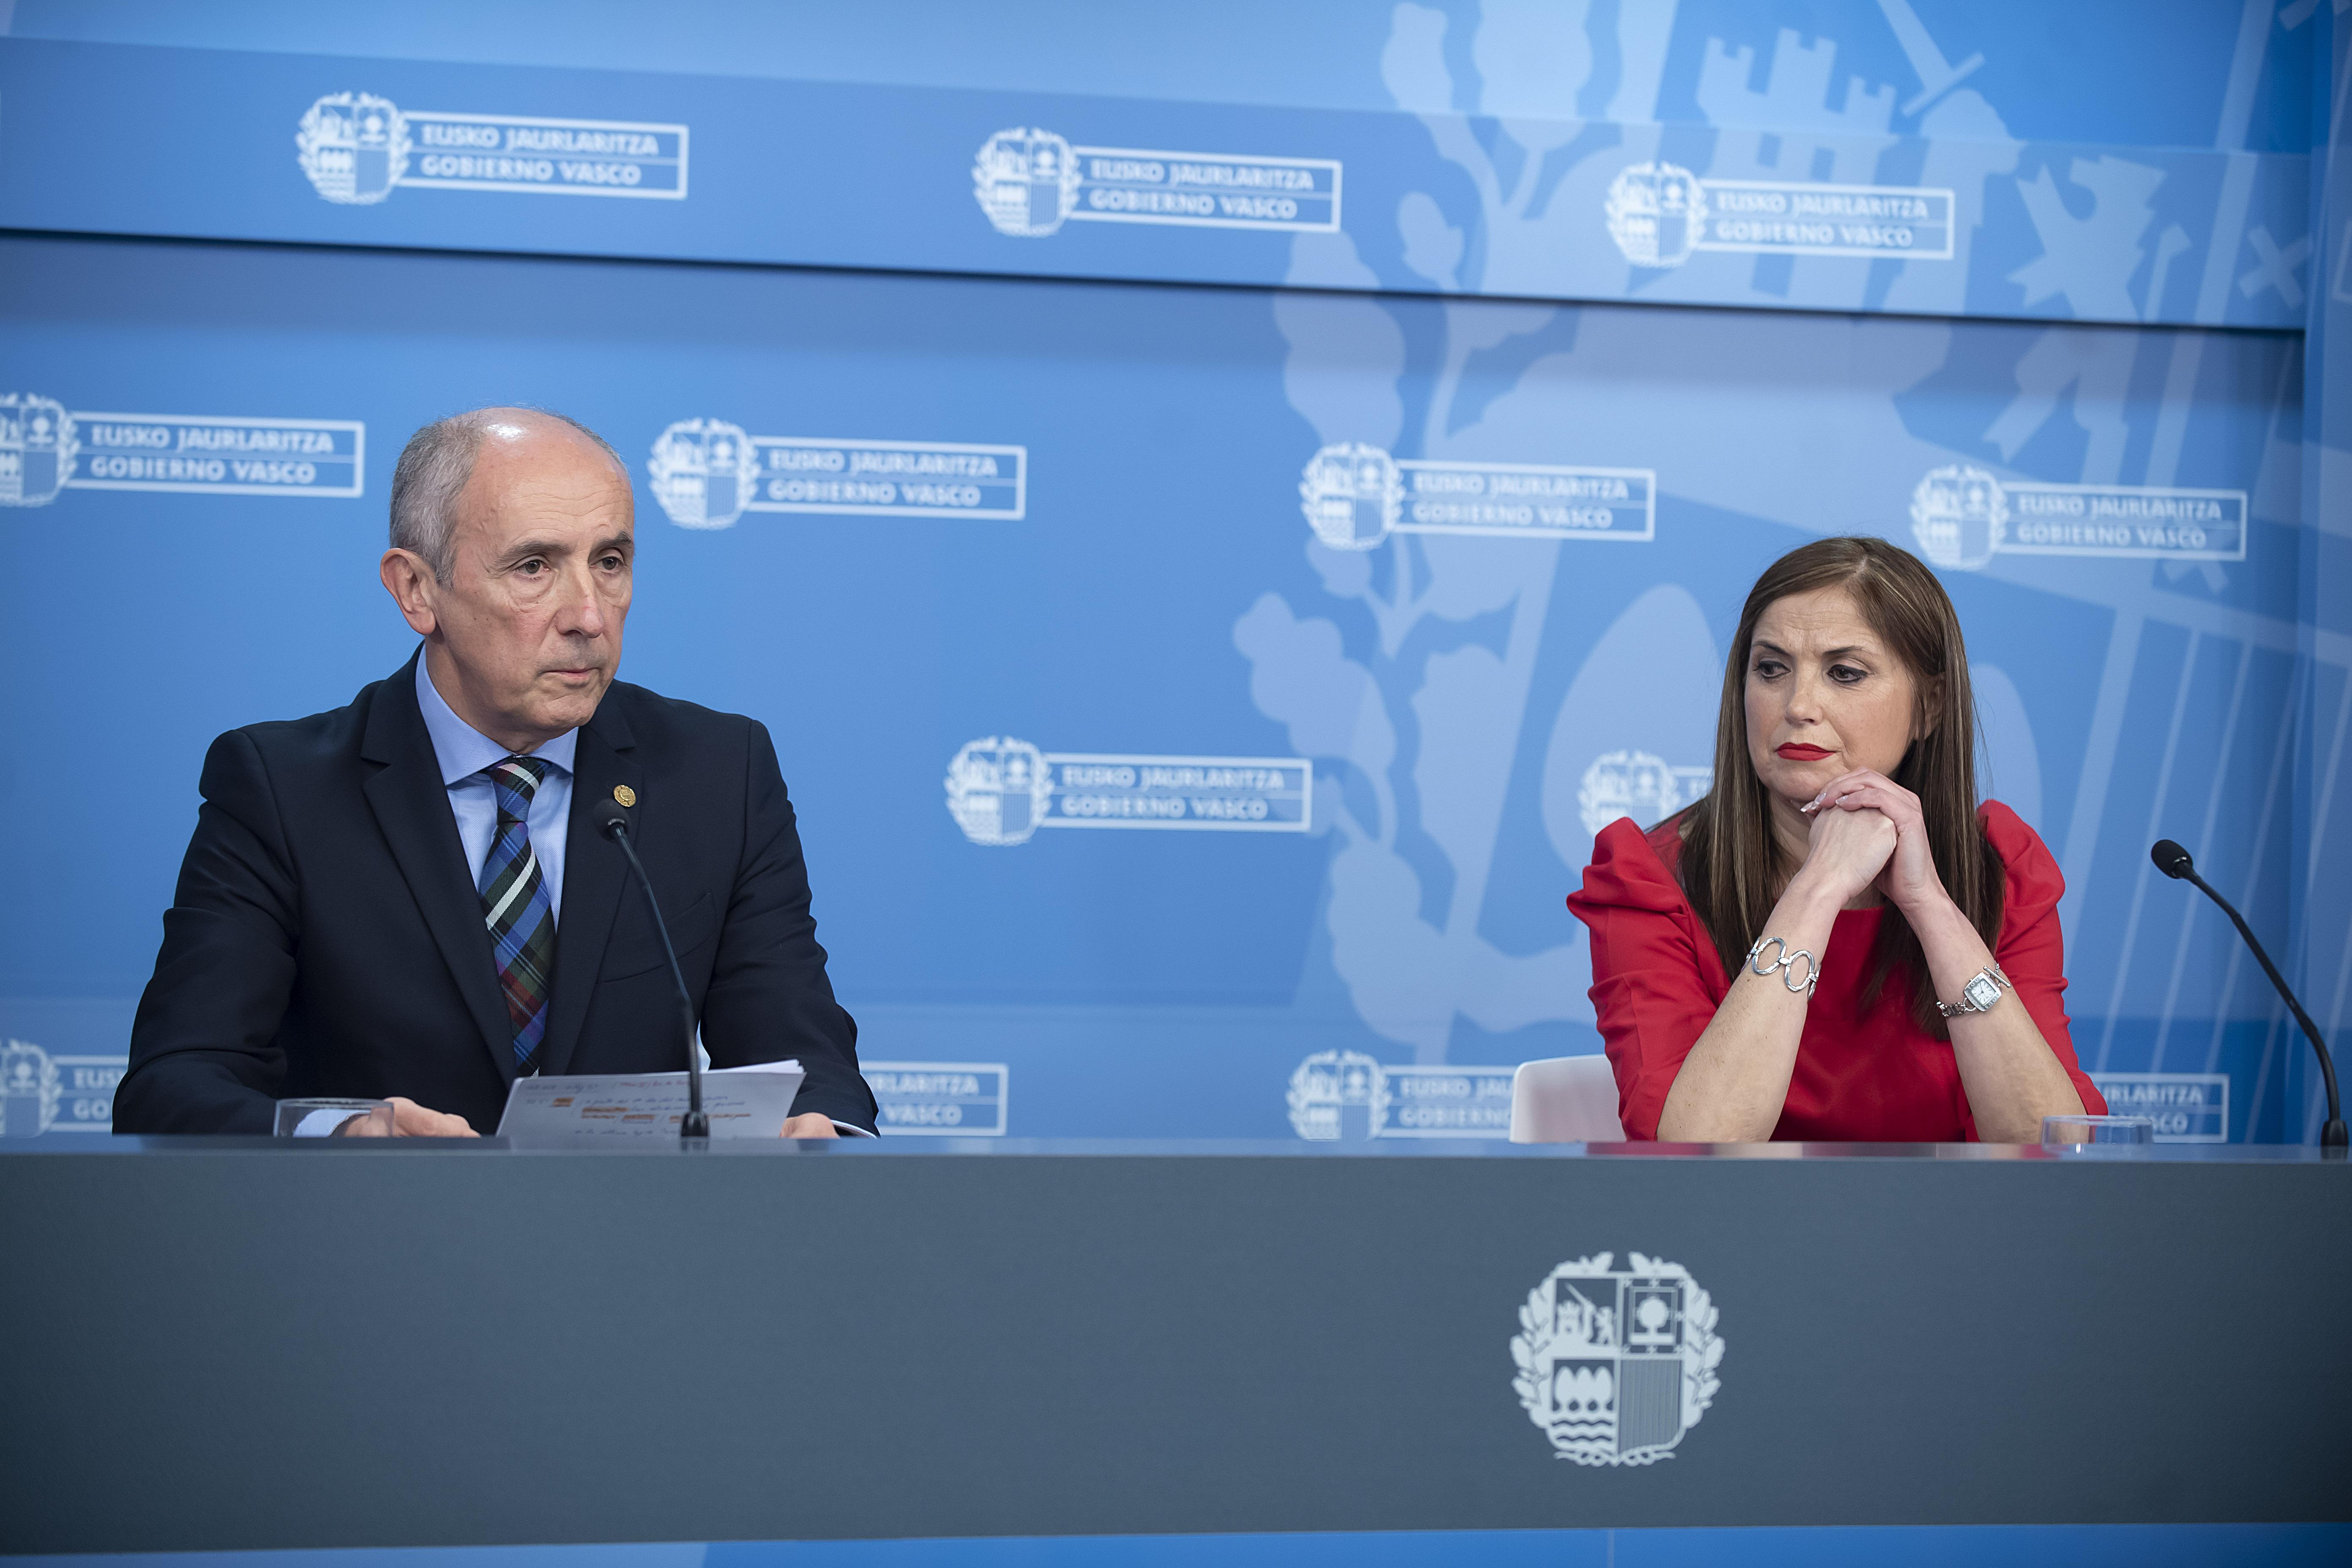 2018_12_18_consejo_gobierno_03.jpg